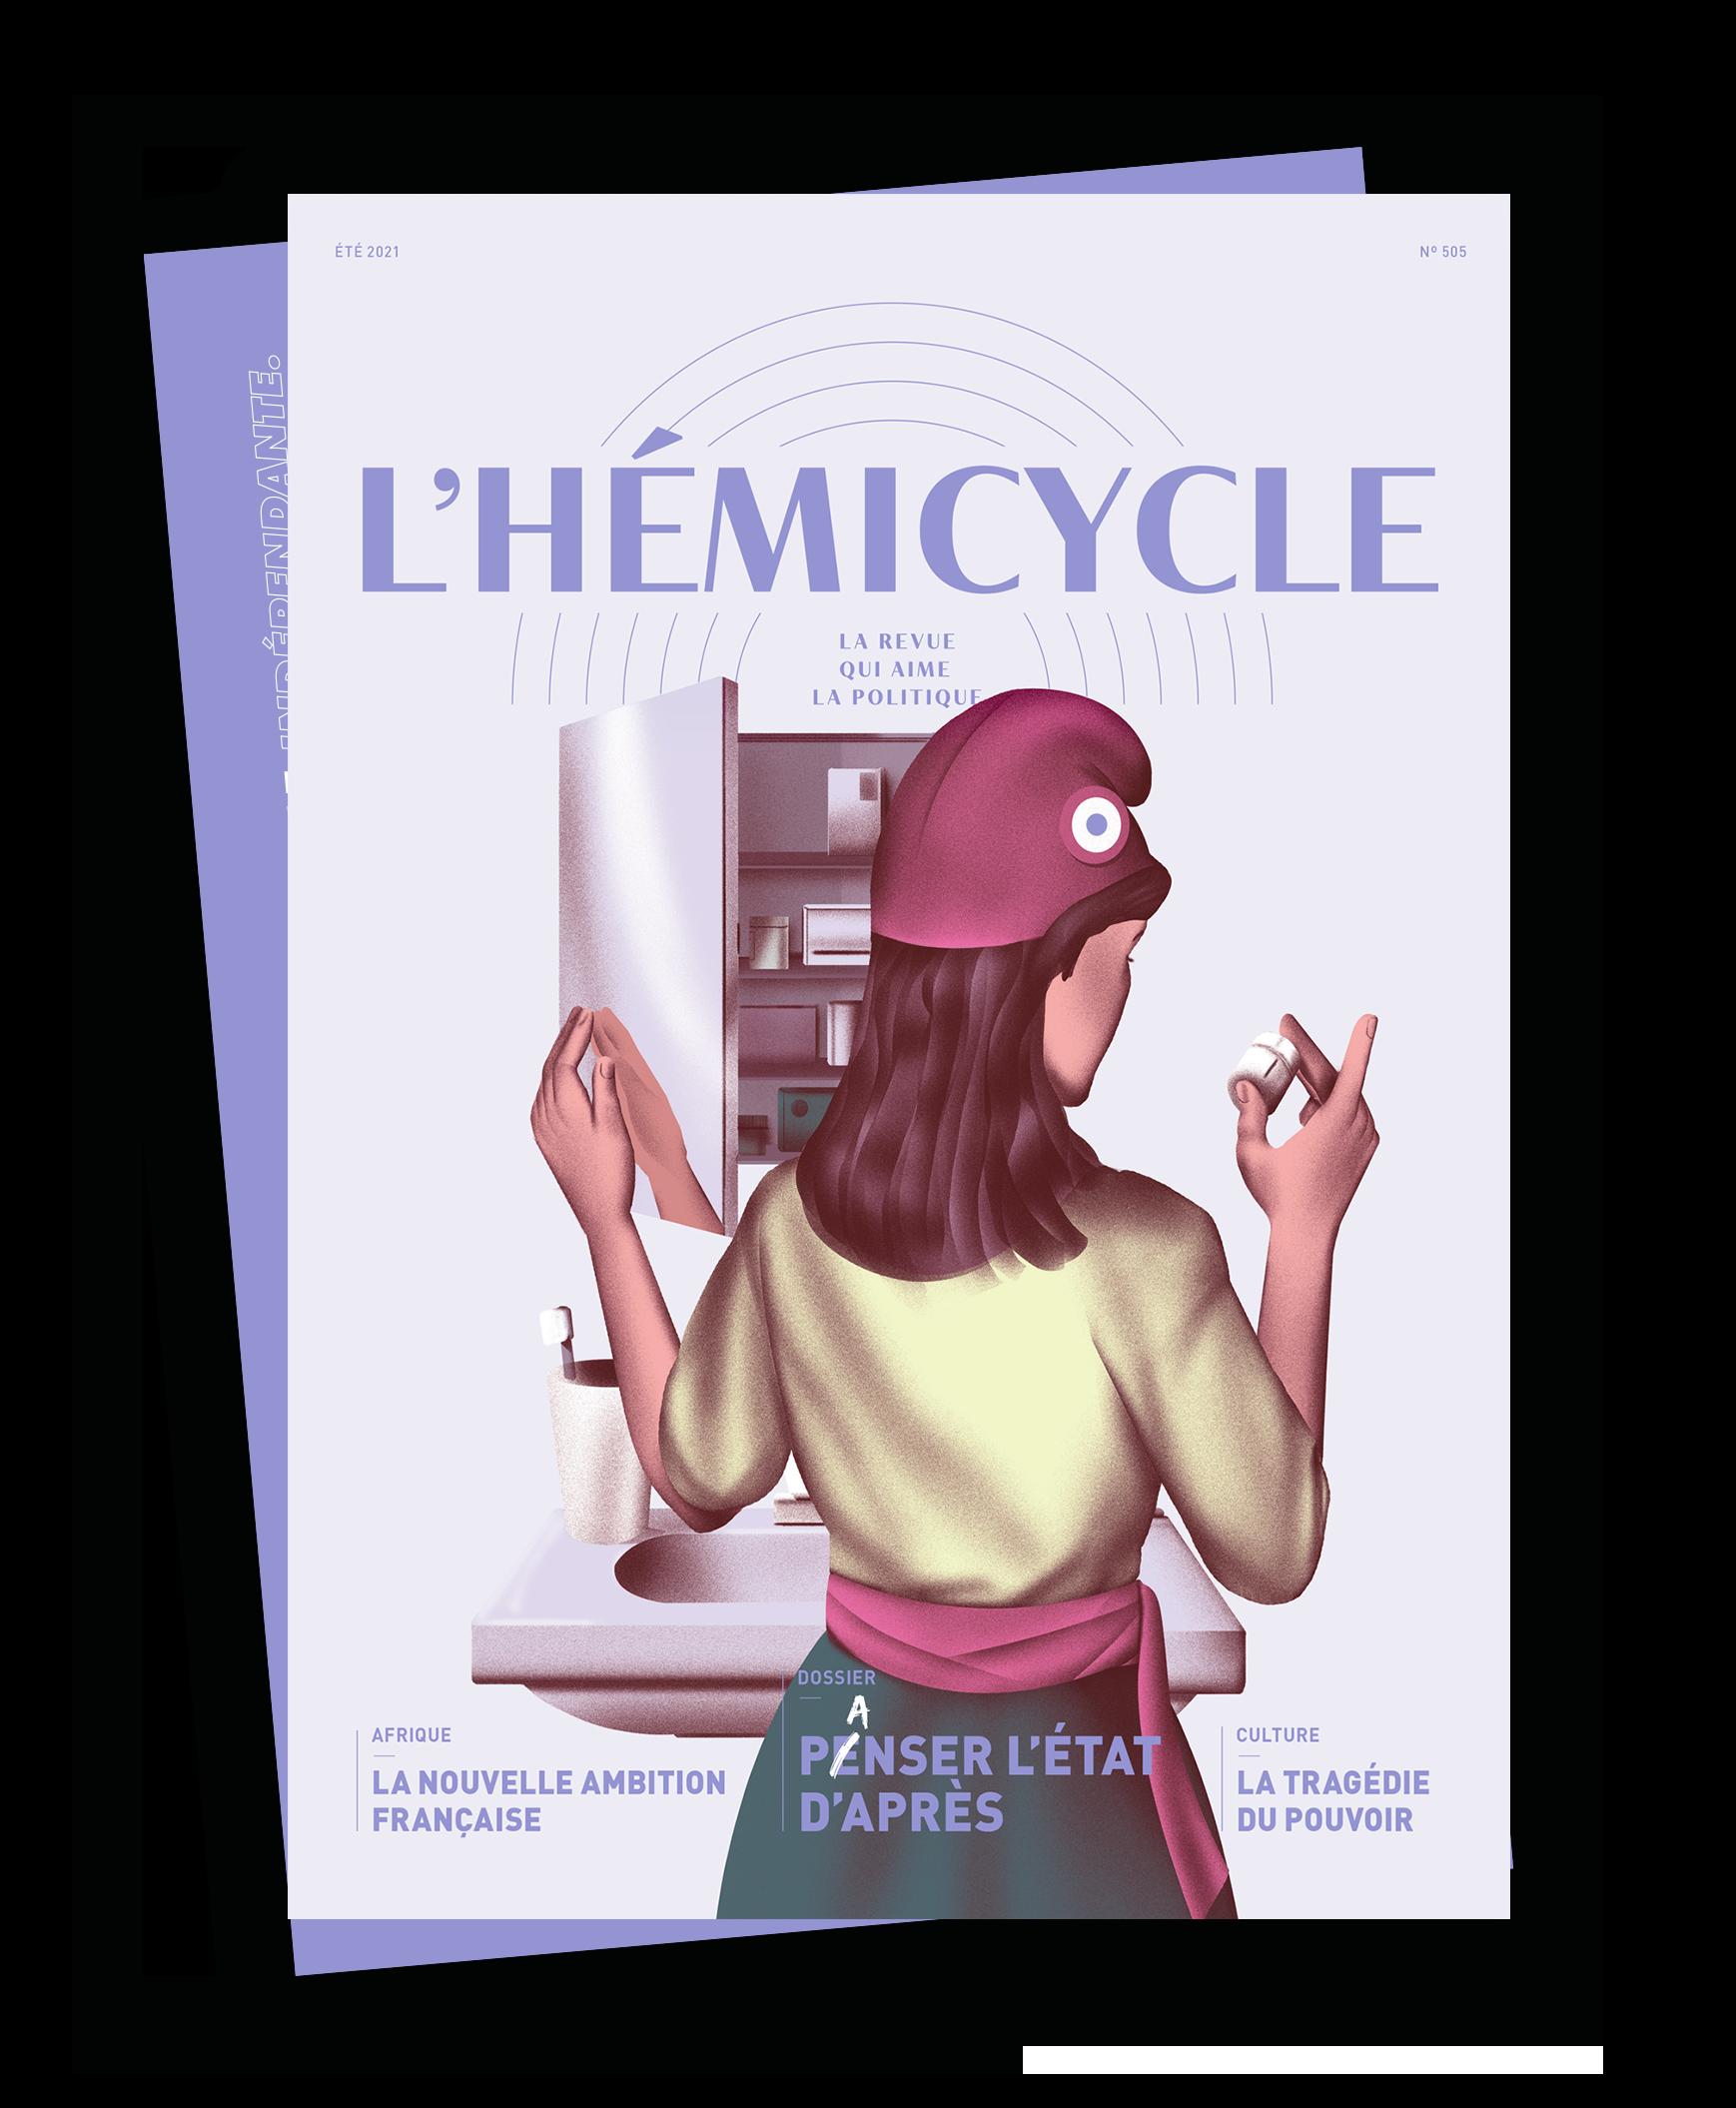 LHemicycle_505